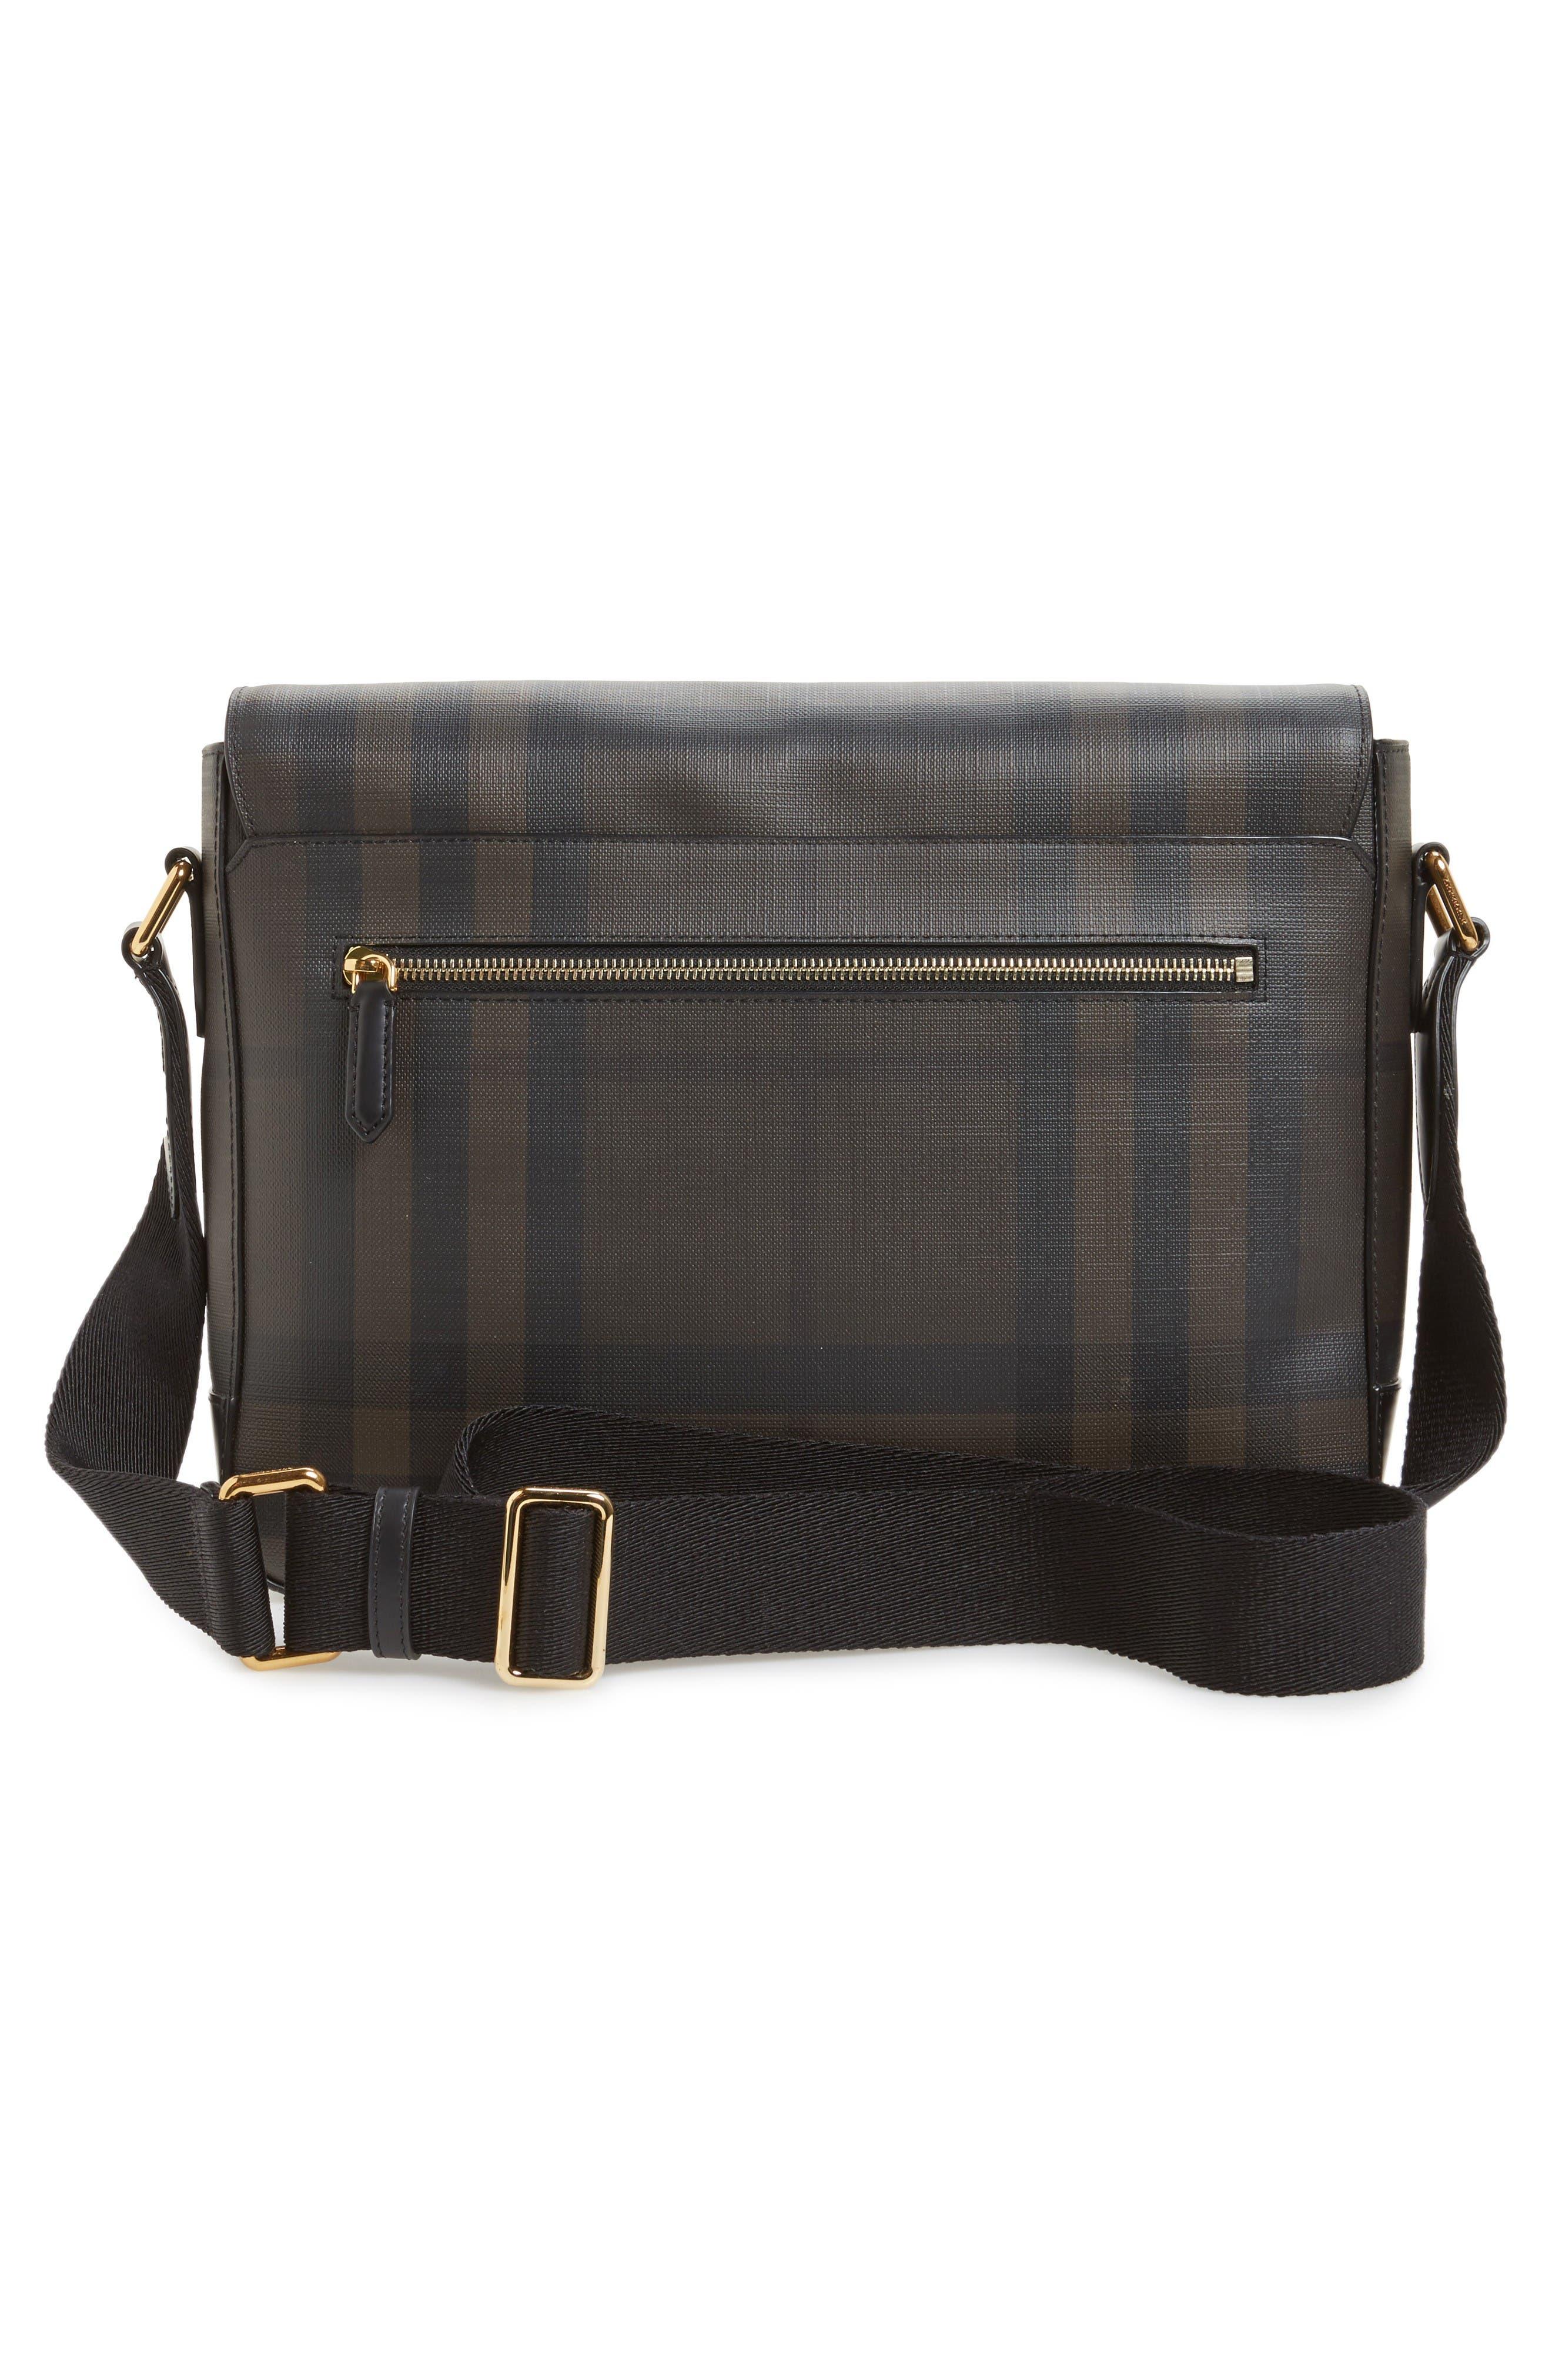 Edgware Check Messenger Bag,                             Alternate thumbnail 3, color,                             Chocolate/ Black